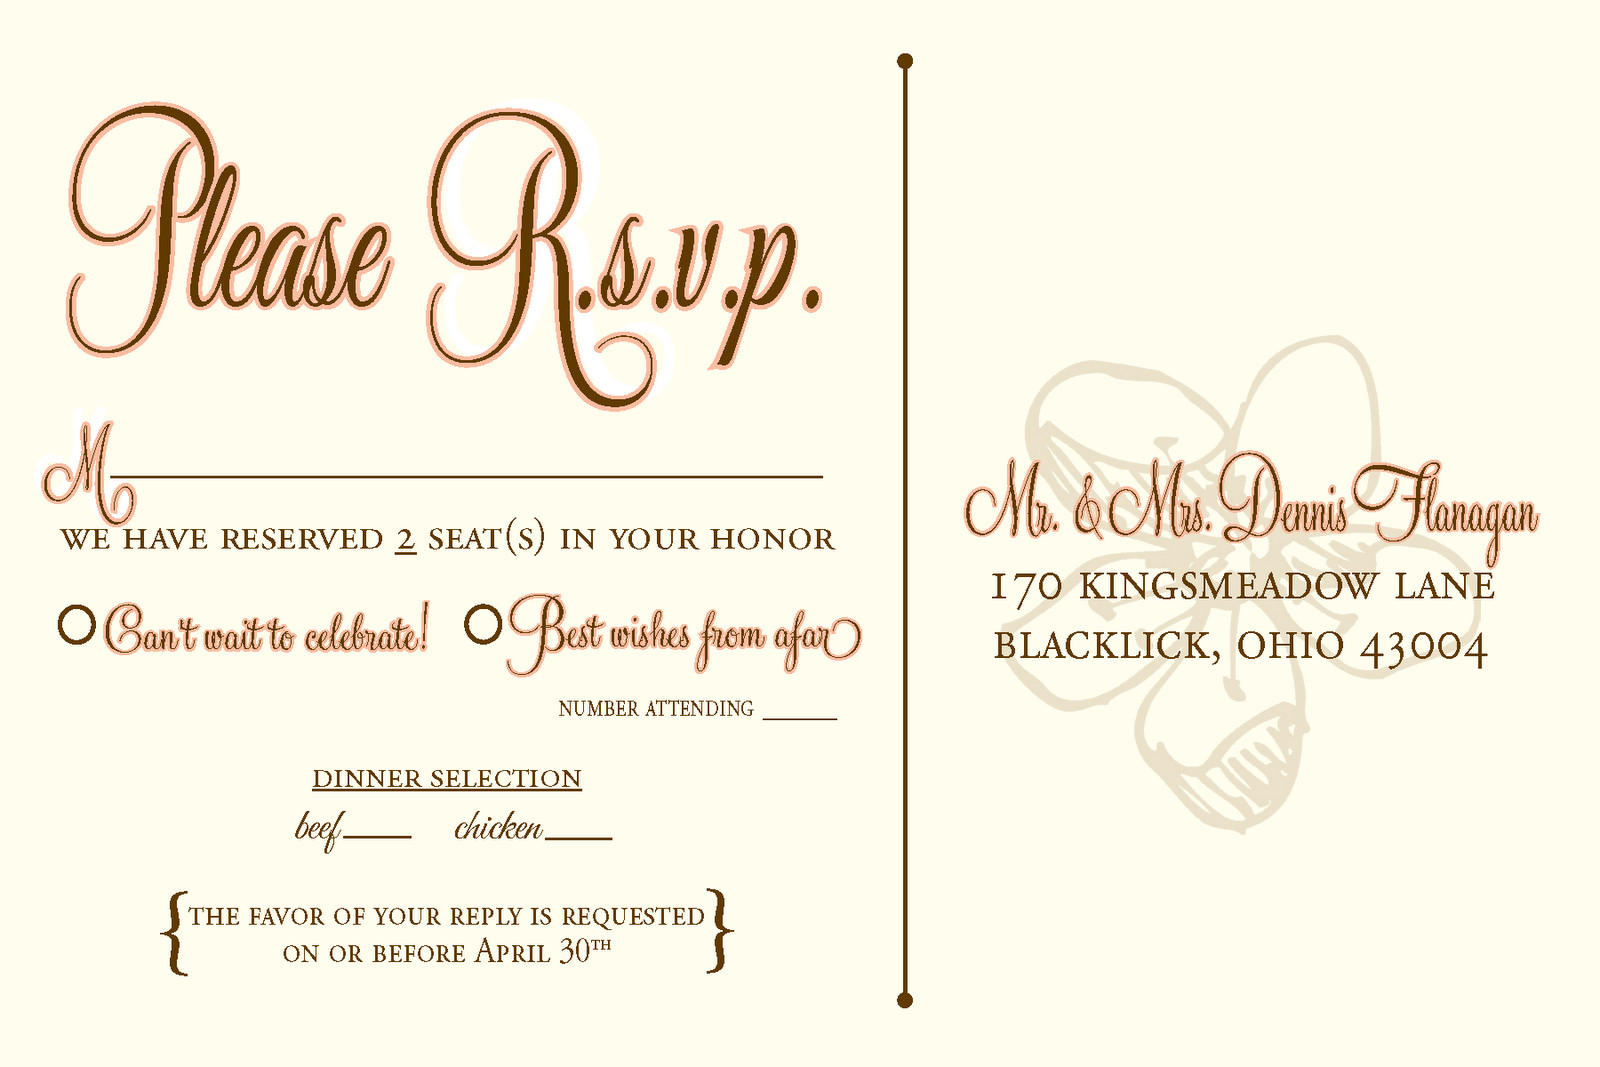 Wedding Rsvp Cards Templates Designs by N Wedding Rsvp Postcards